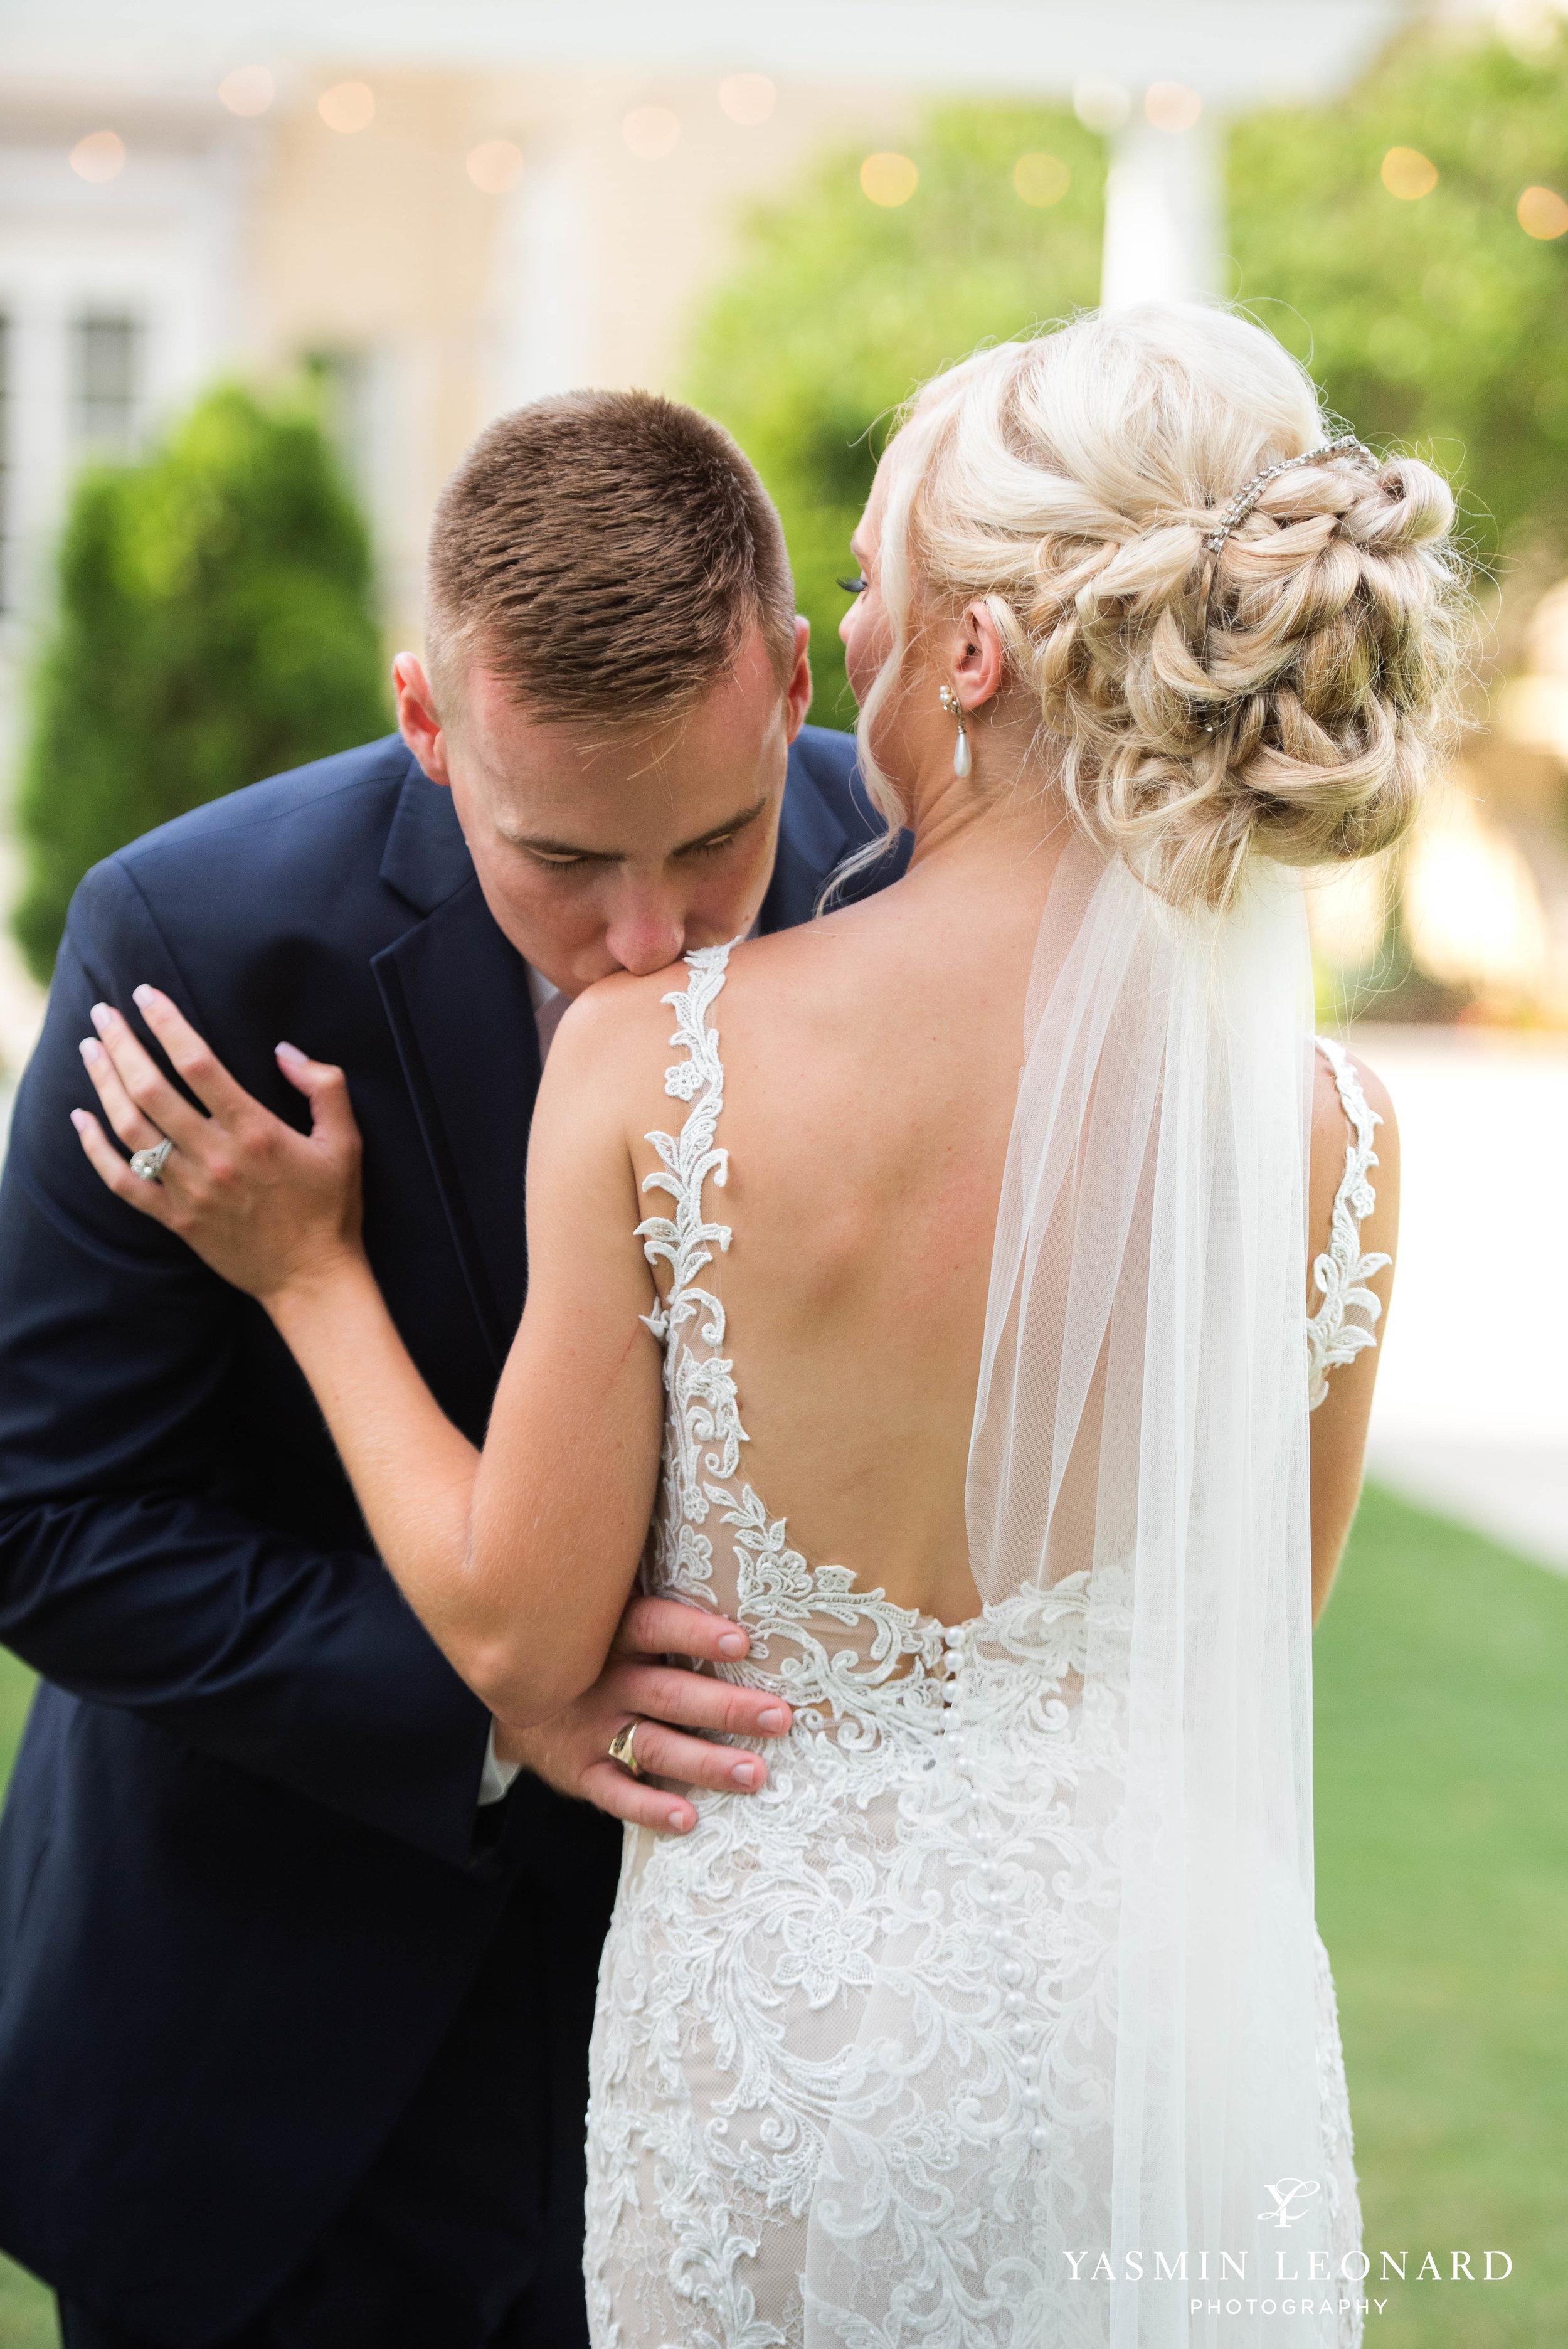 Separk Mansion - NC Weddings - Gastonia Wedding - NC Wedding Venues - Pink and Blue Wedding Ideas - Pink Bridesmaid Dresses - Yasmin Leonard Photography-35.jpg